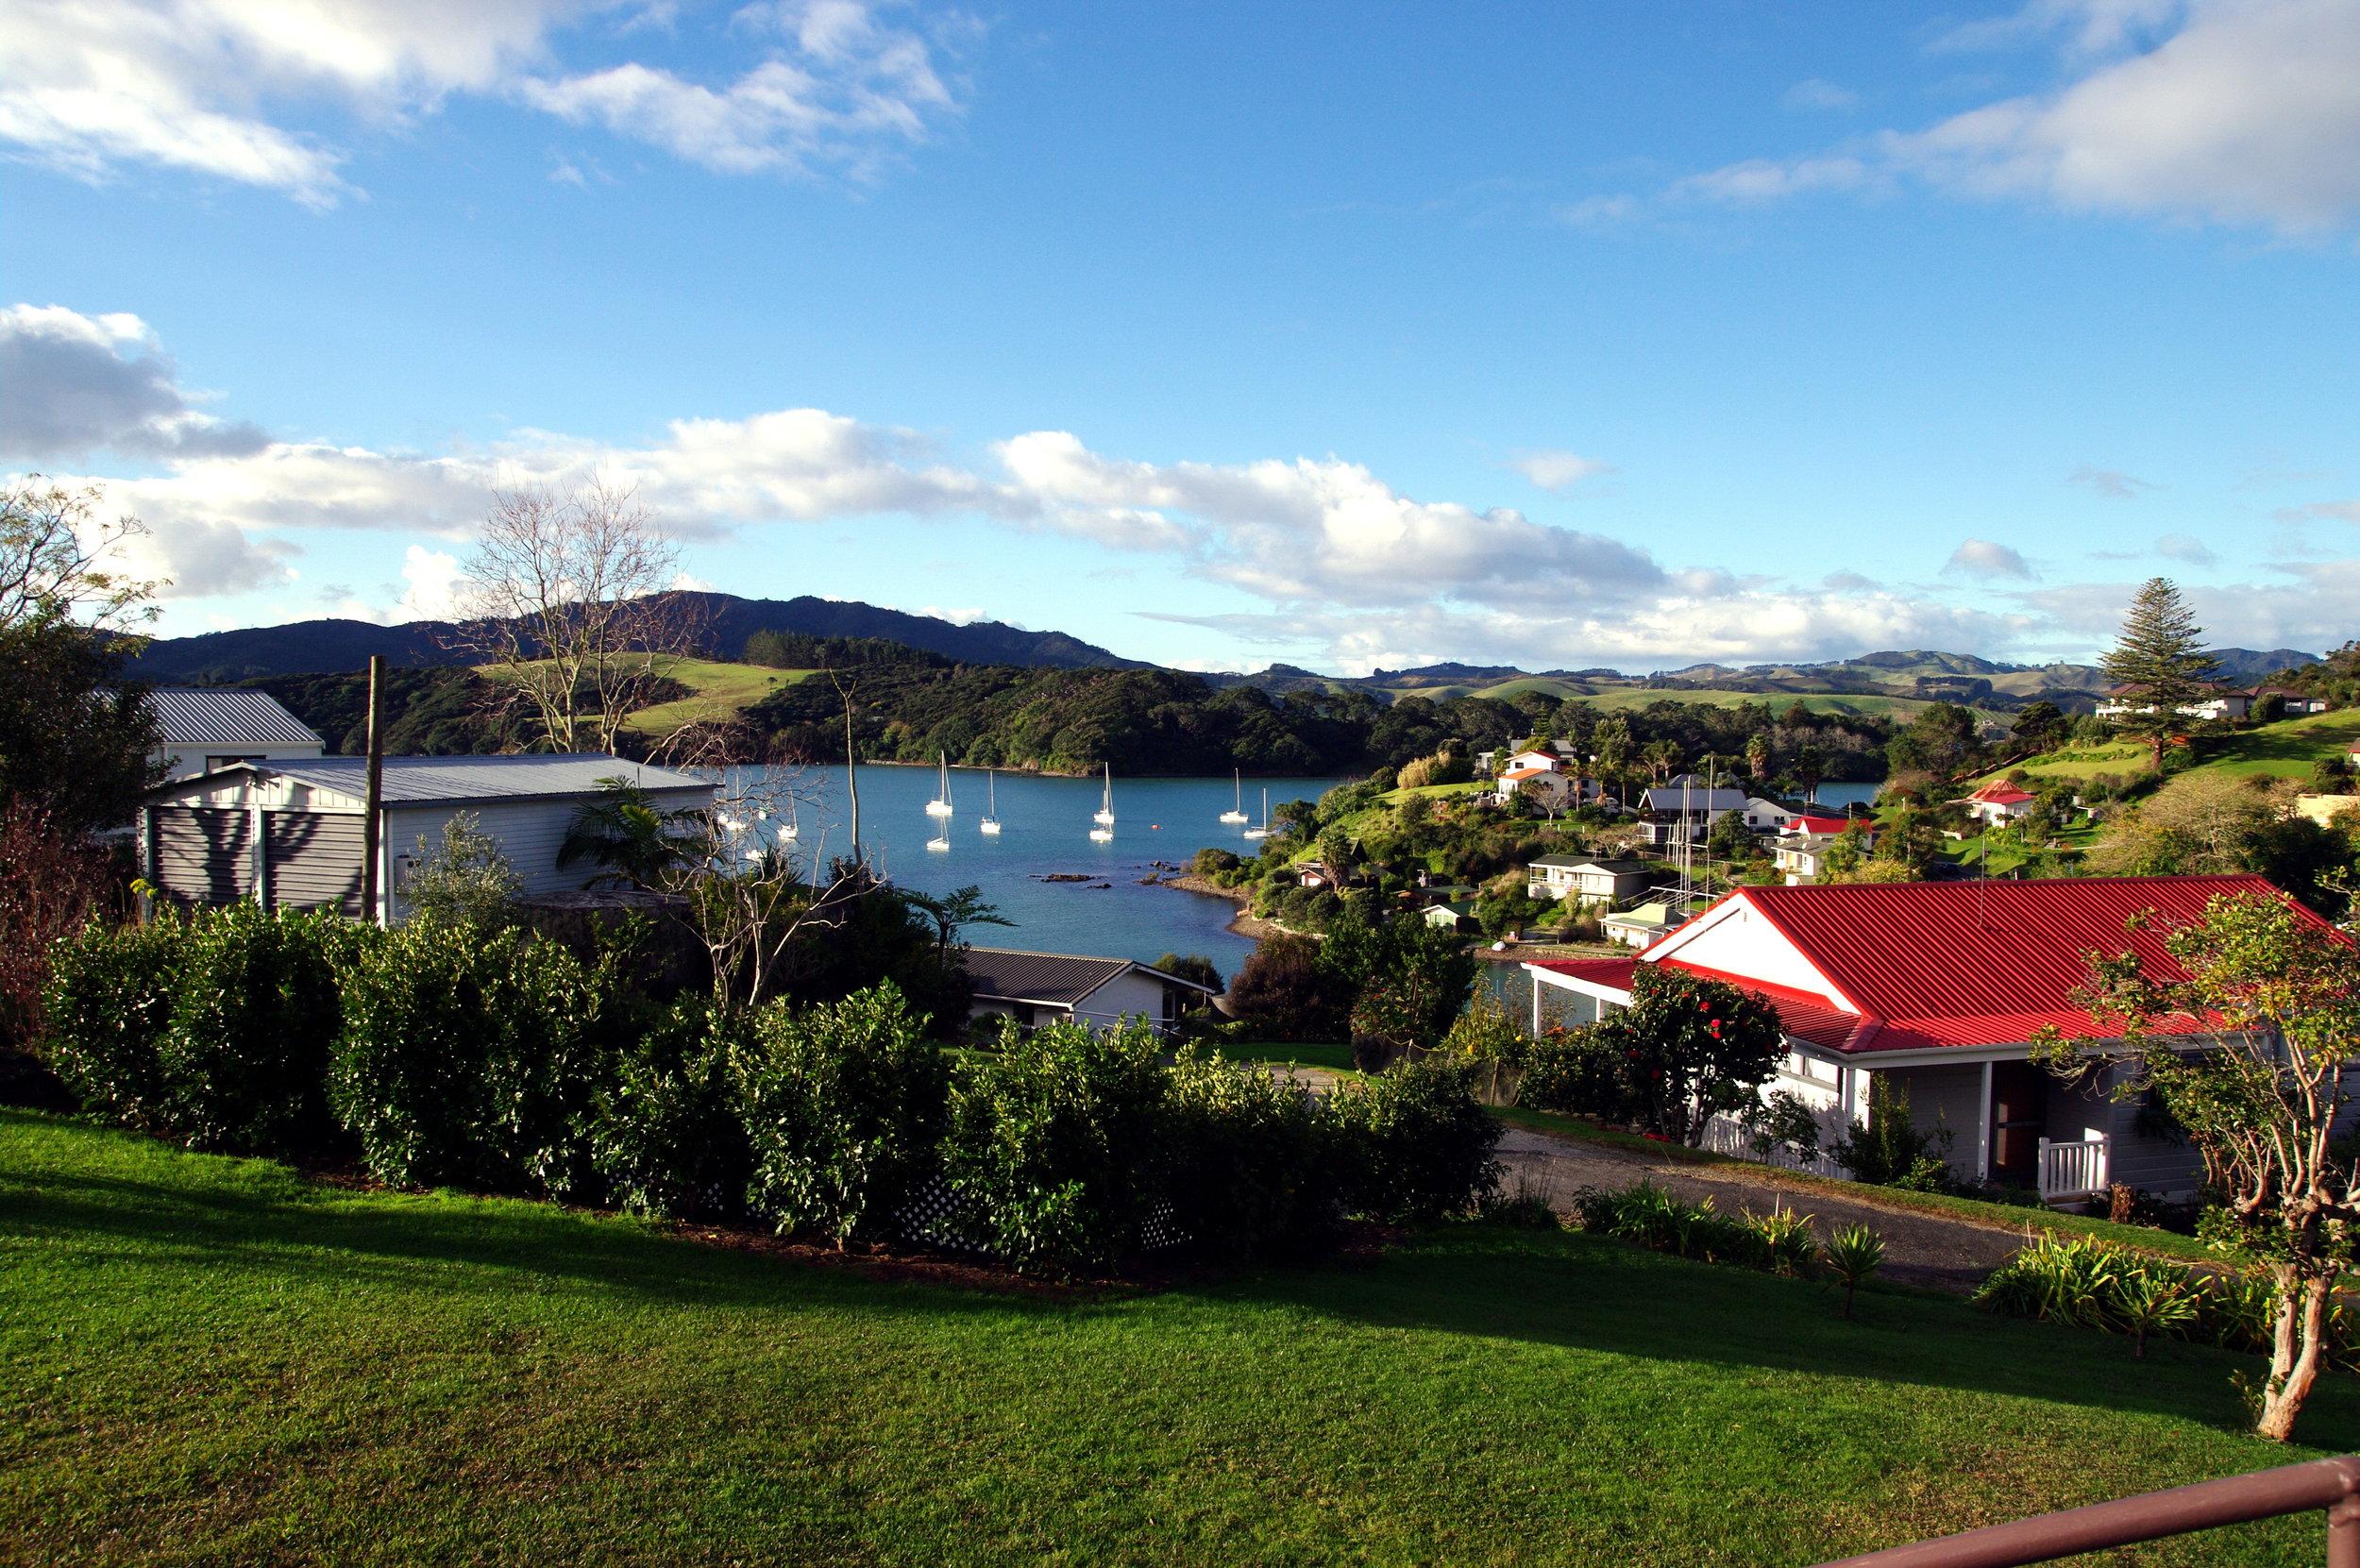 NZ Across the bay.jpg